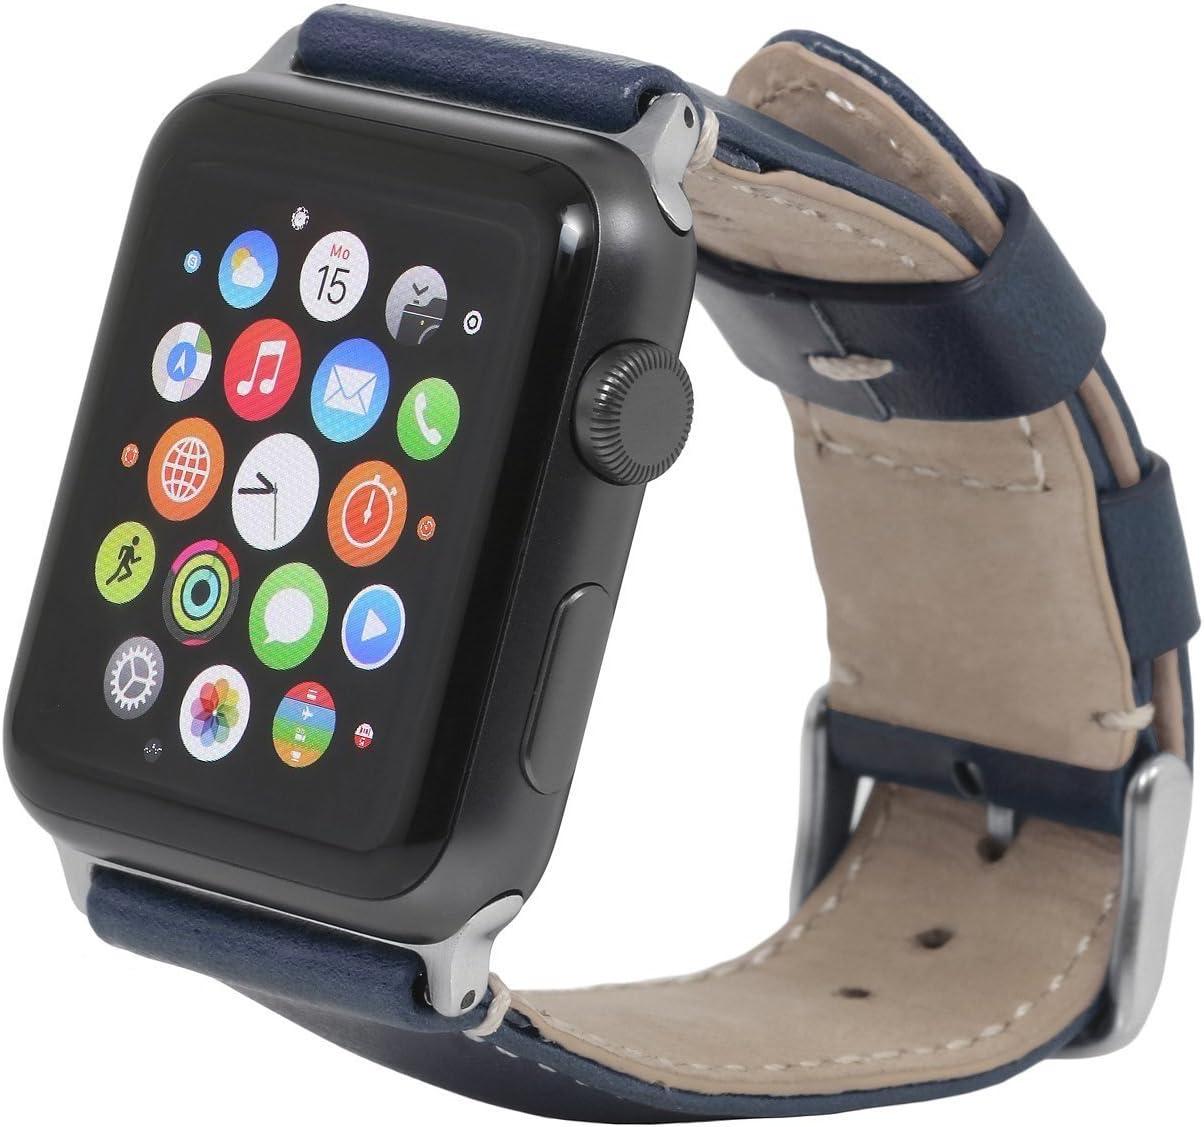 Stilgut Watch Strap Leder Uhrenarmband Kompatibel Mit Elektronik